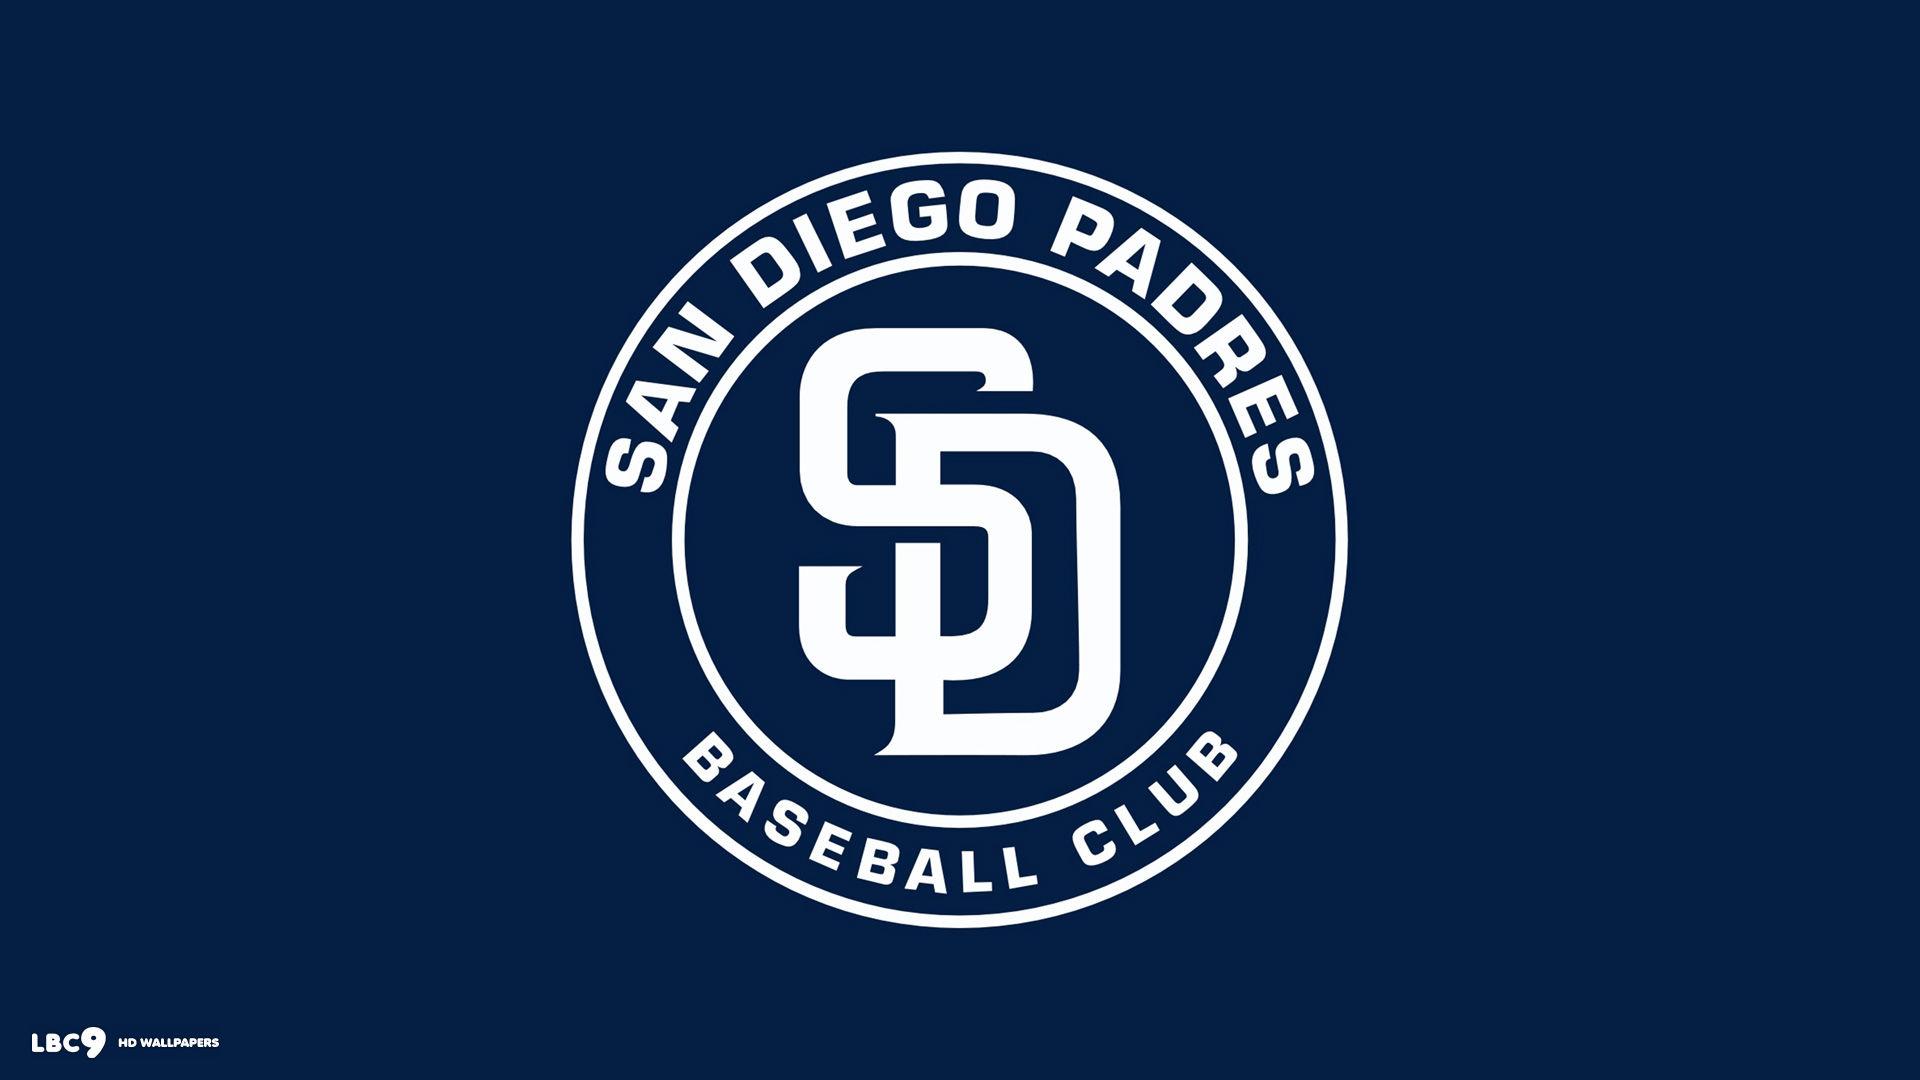 San Diego Padres Mlb Baseball 4 Wallpaper 1920x1080